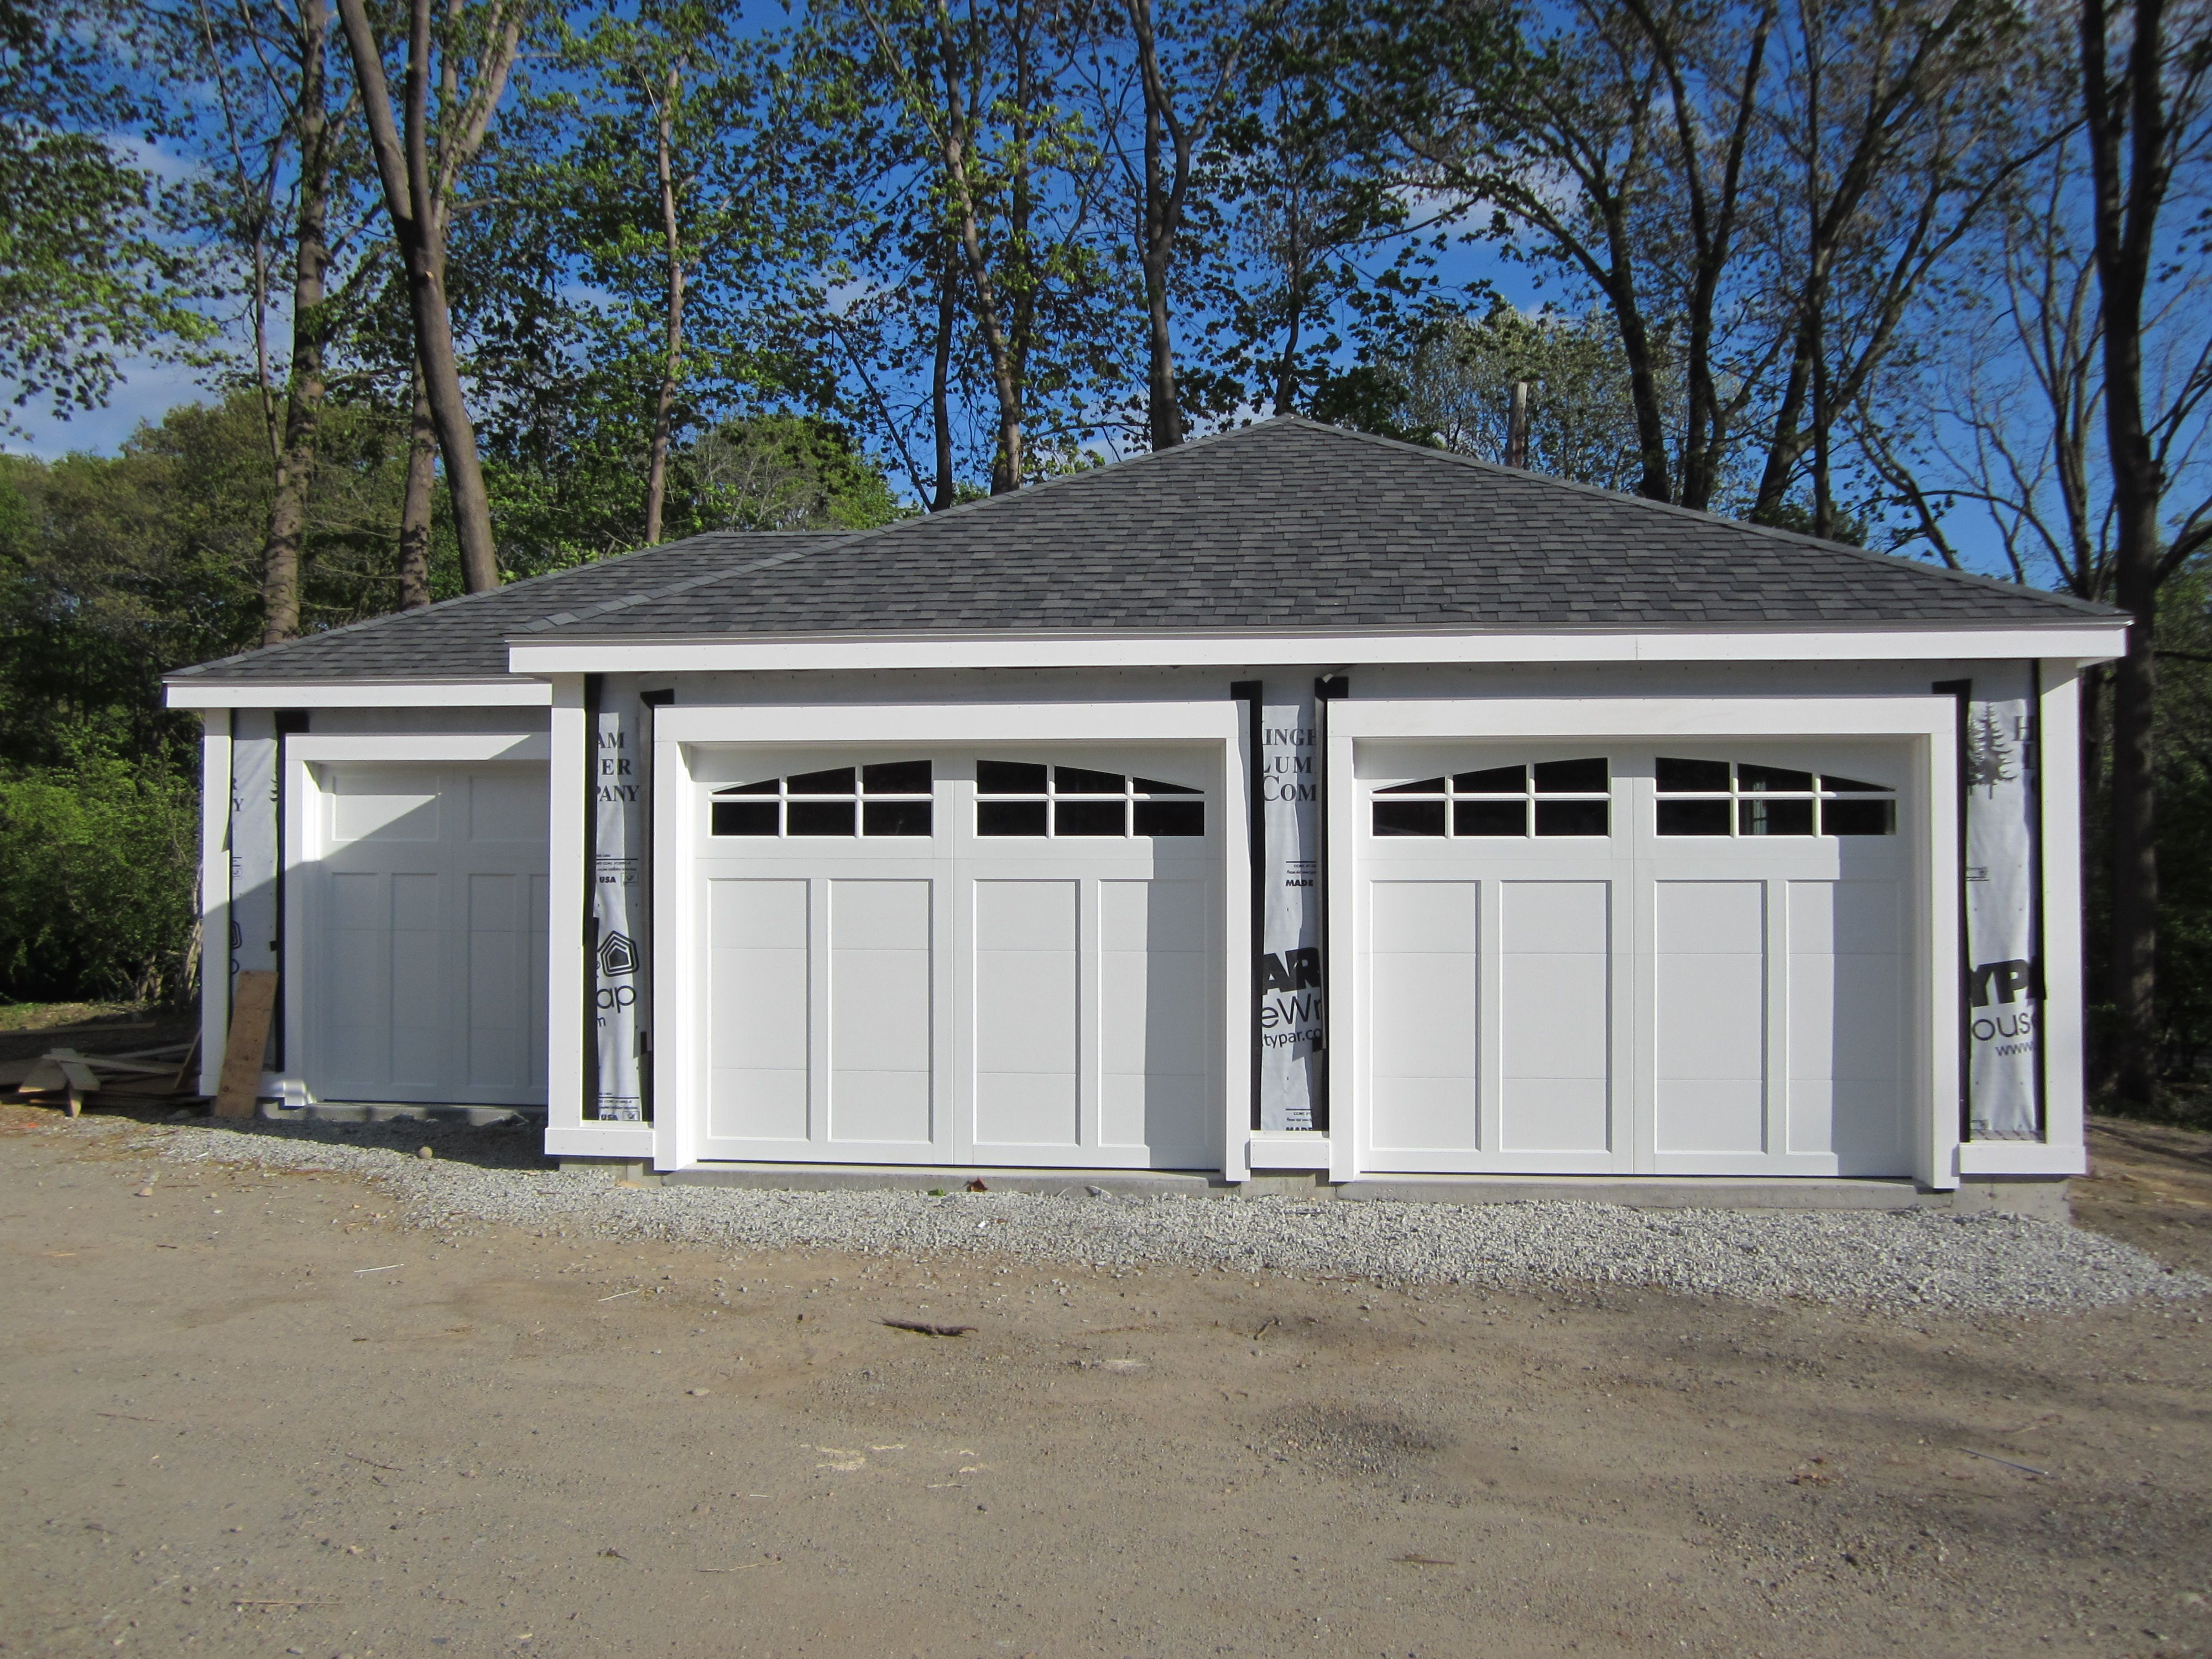 American Garage Home - 77e98469f27c6c715dc2d0b4affa3387_Most Inspiring American Garage Home - 77e98469f27c6c715dc2d0b4affa3387  Pictures_748696.jpg